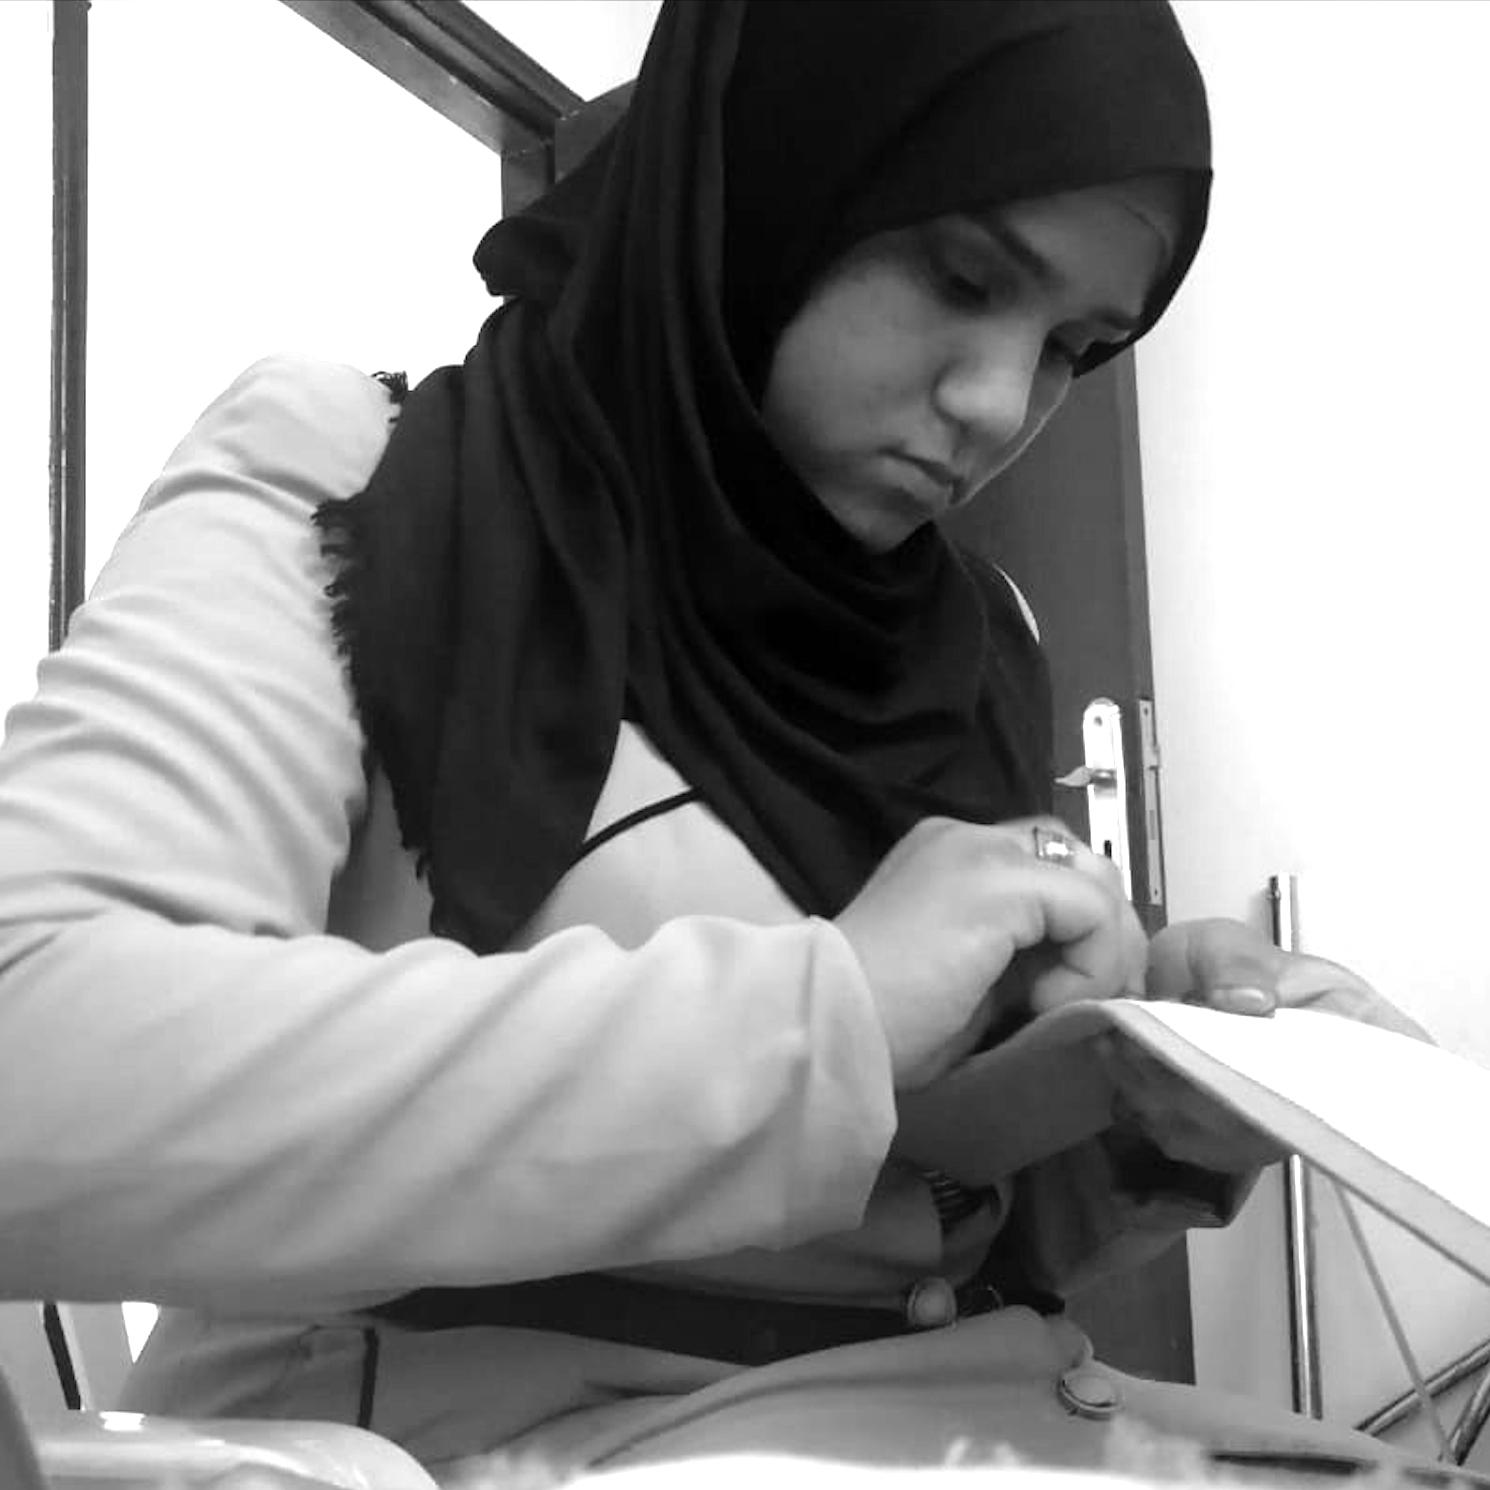 Nicole_Rose_Studio_Yaday_collective_smile_and_olive_artisan_syrian_refugee_handmade_home_decor.jpg